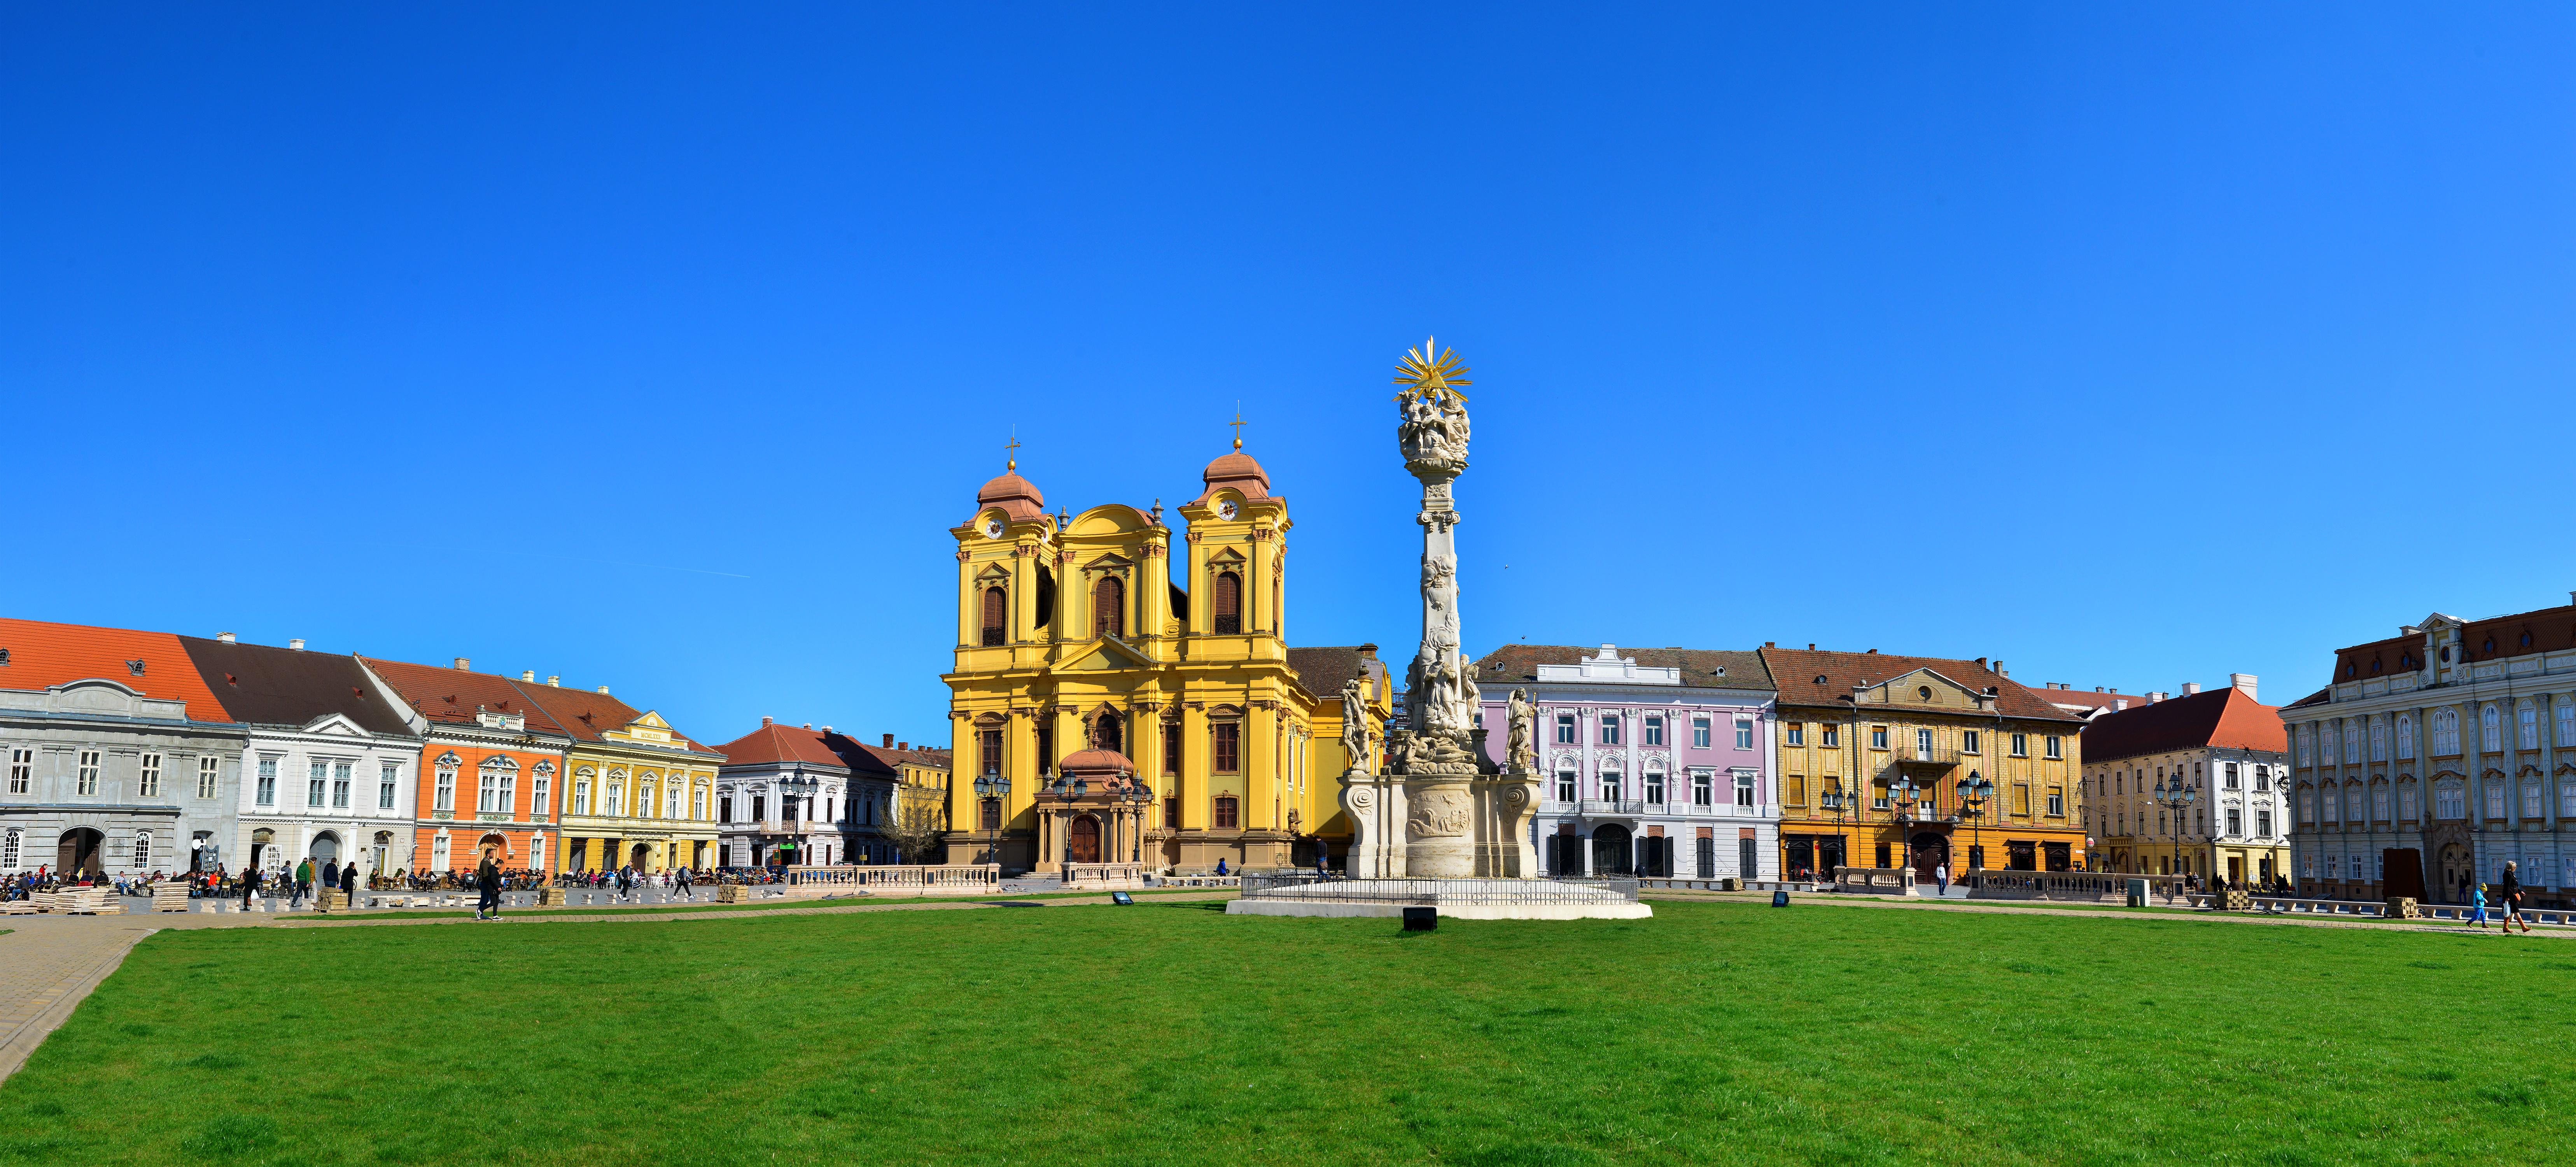 timisoara city romania roman catholic dome landmark architecture panorama